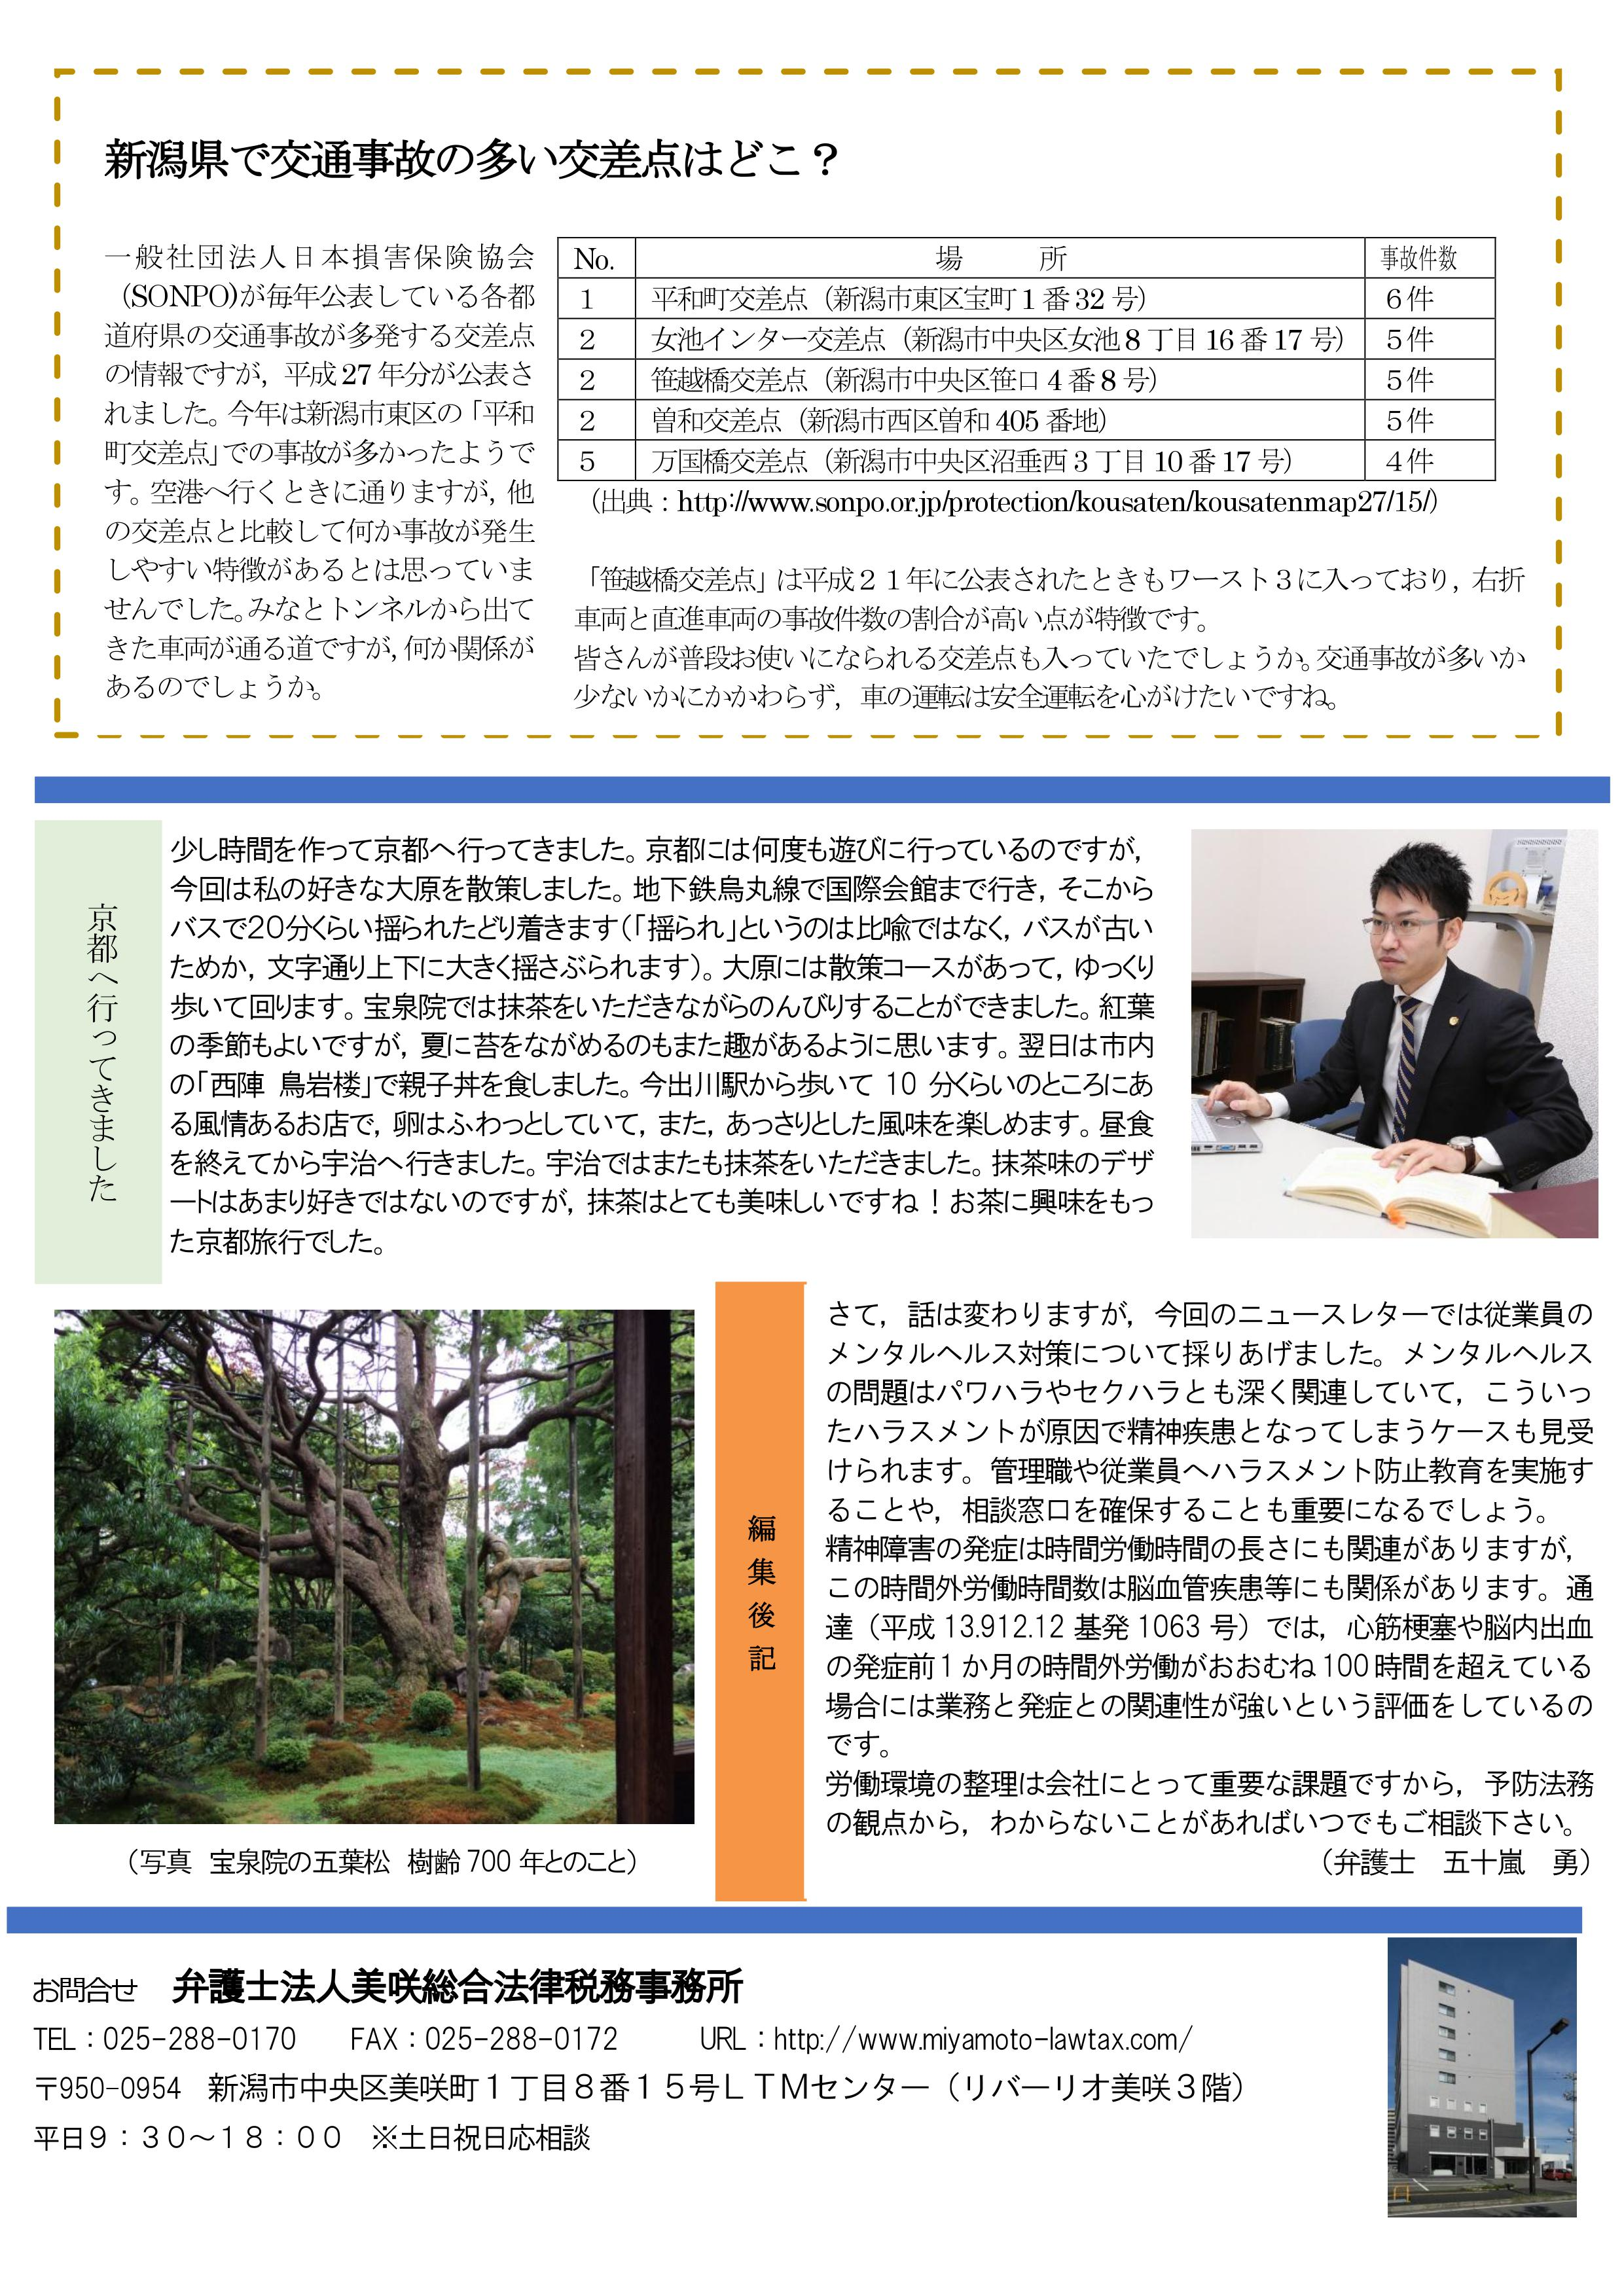 201610MISAKINewsletterVol.5-2.jpg